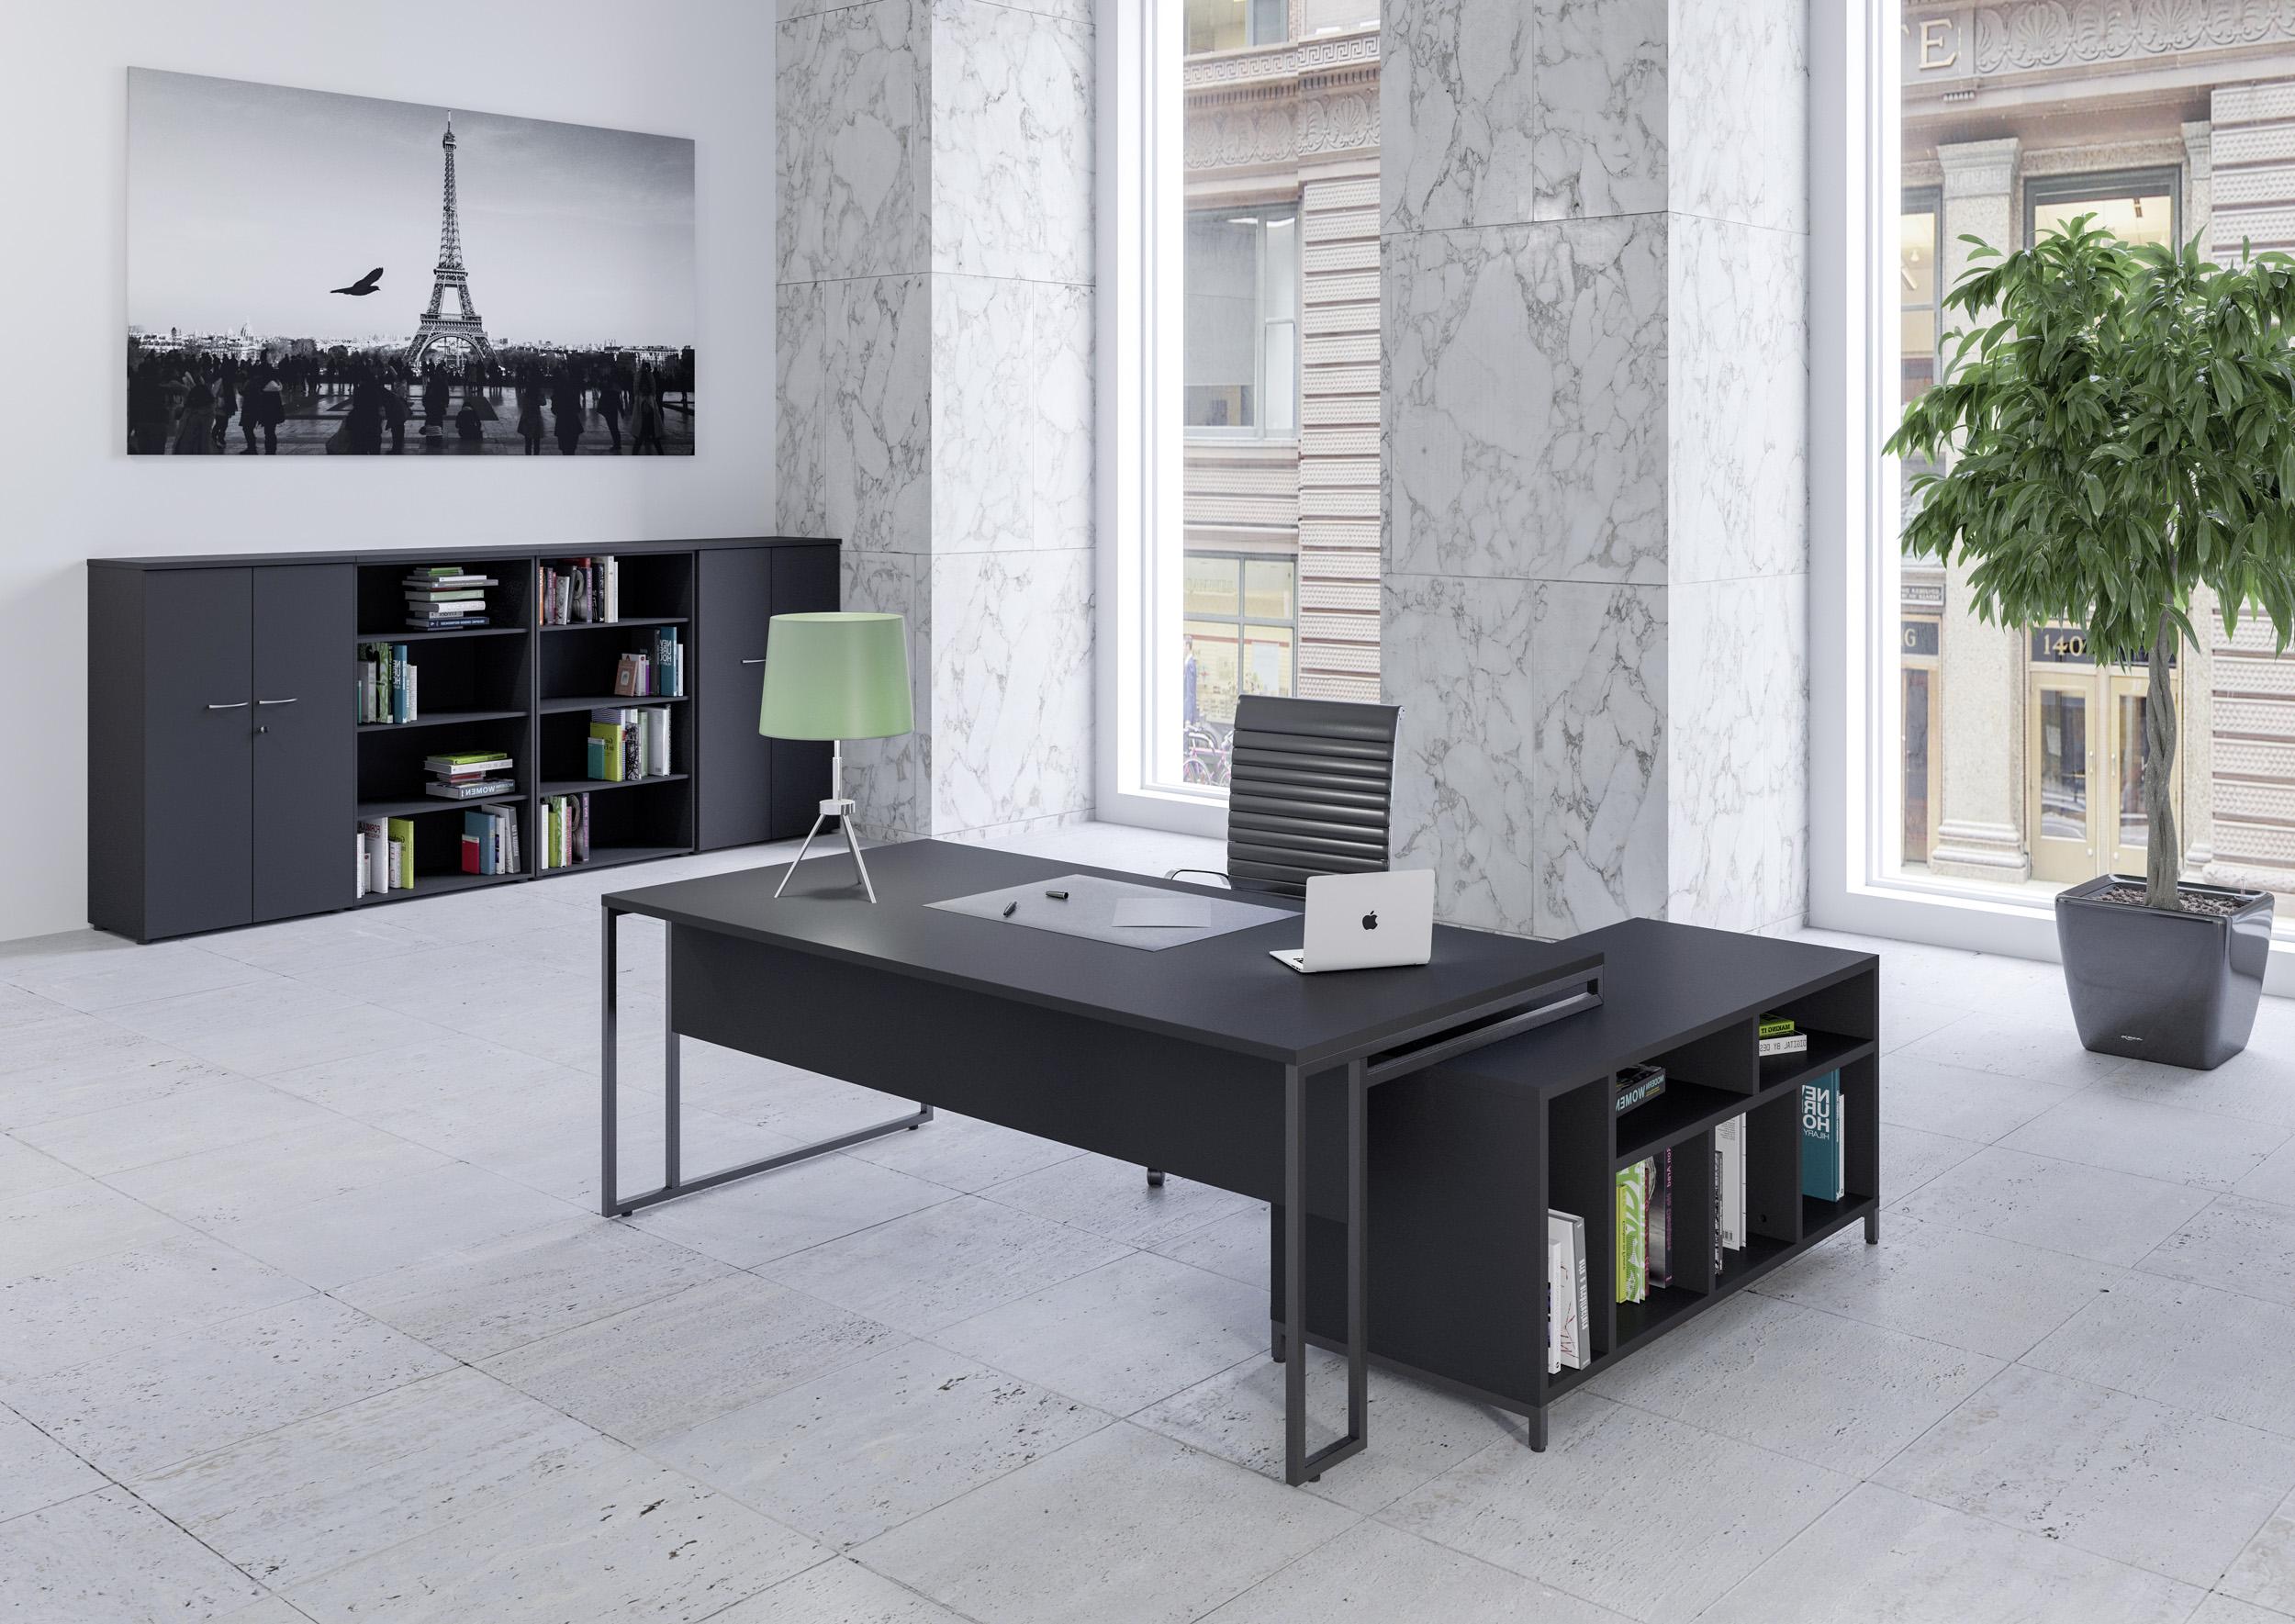 Stricto Sensu Executive Desk